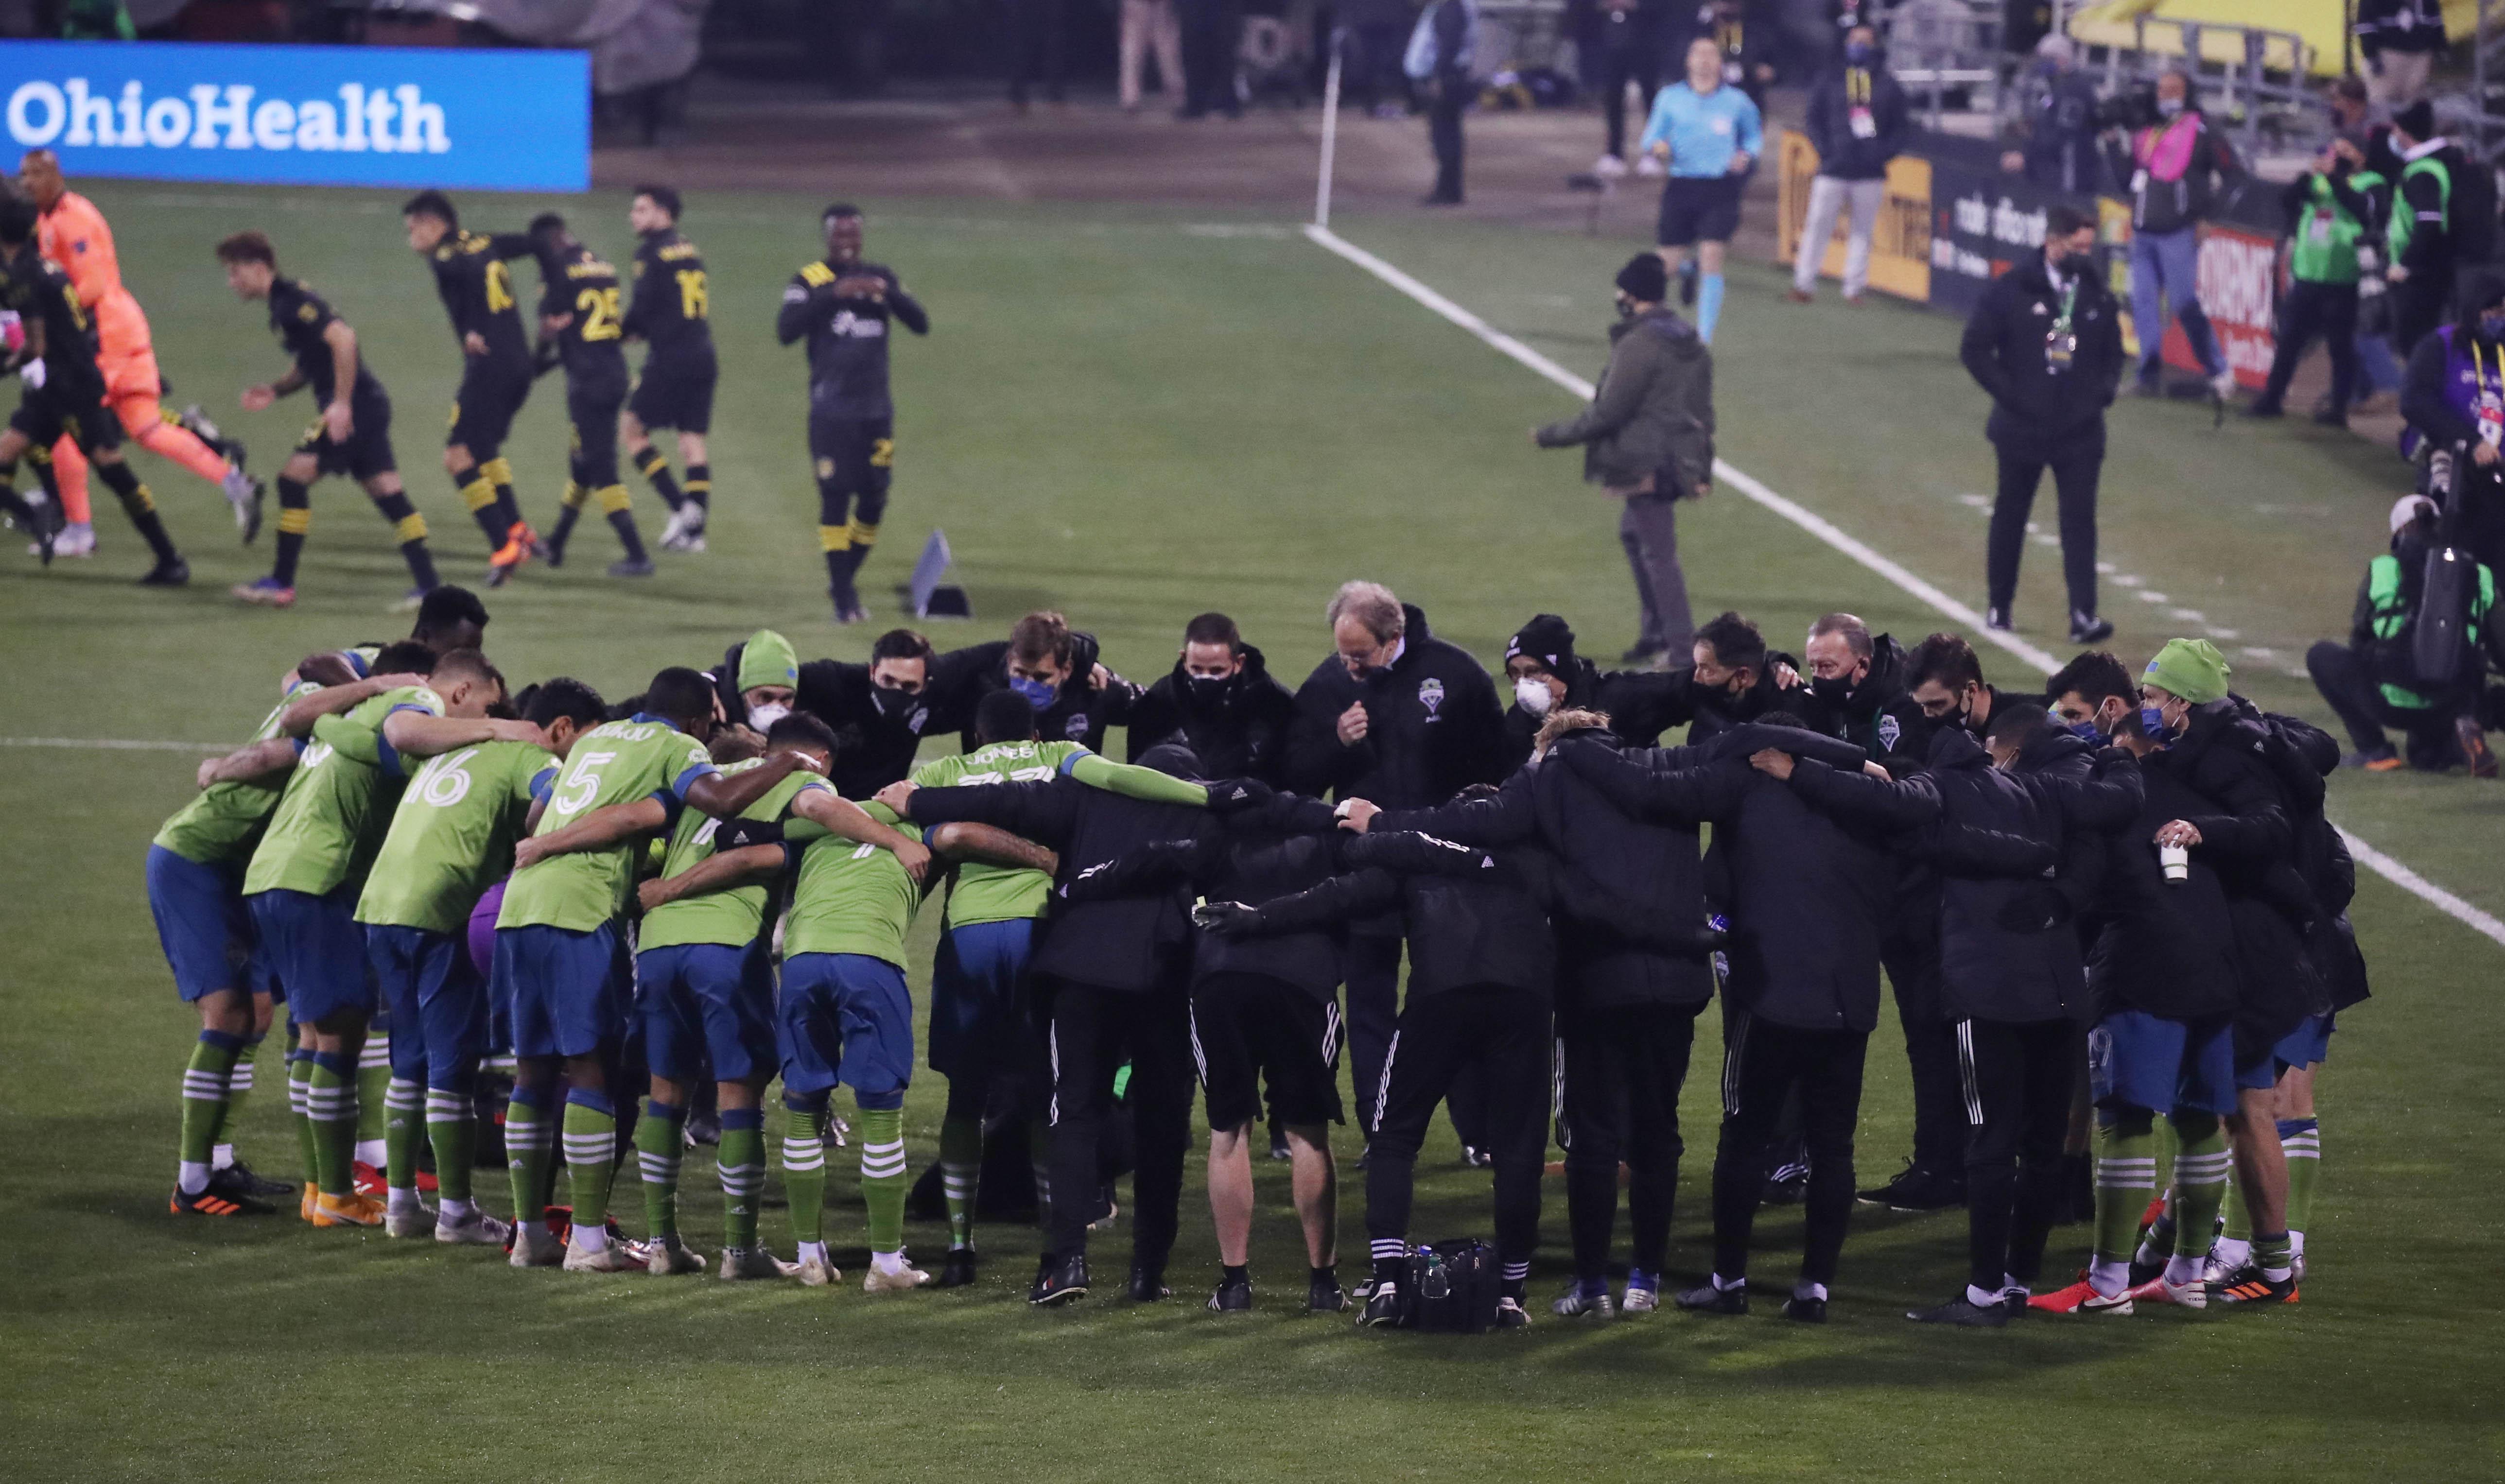 MLS: Cup Final-Seattle Sounders FC vs Columbus Crew SC